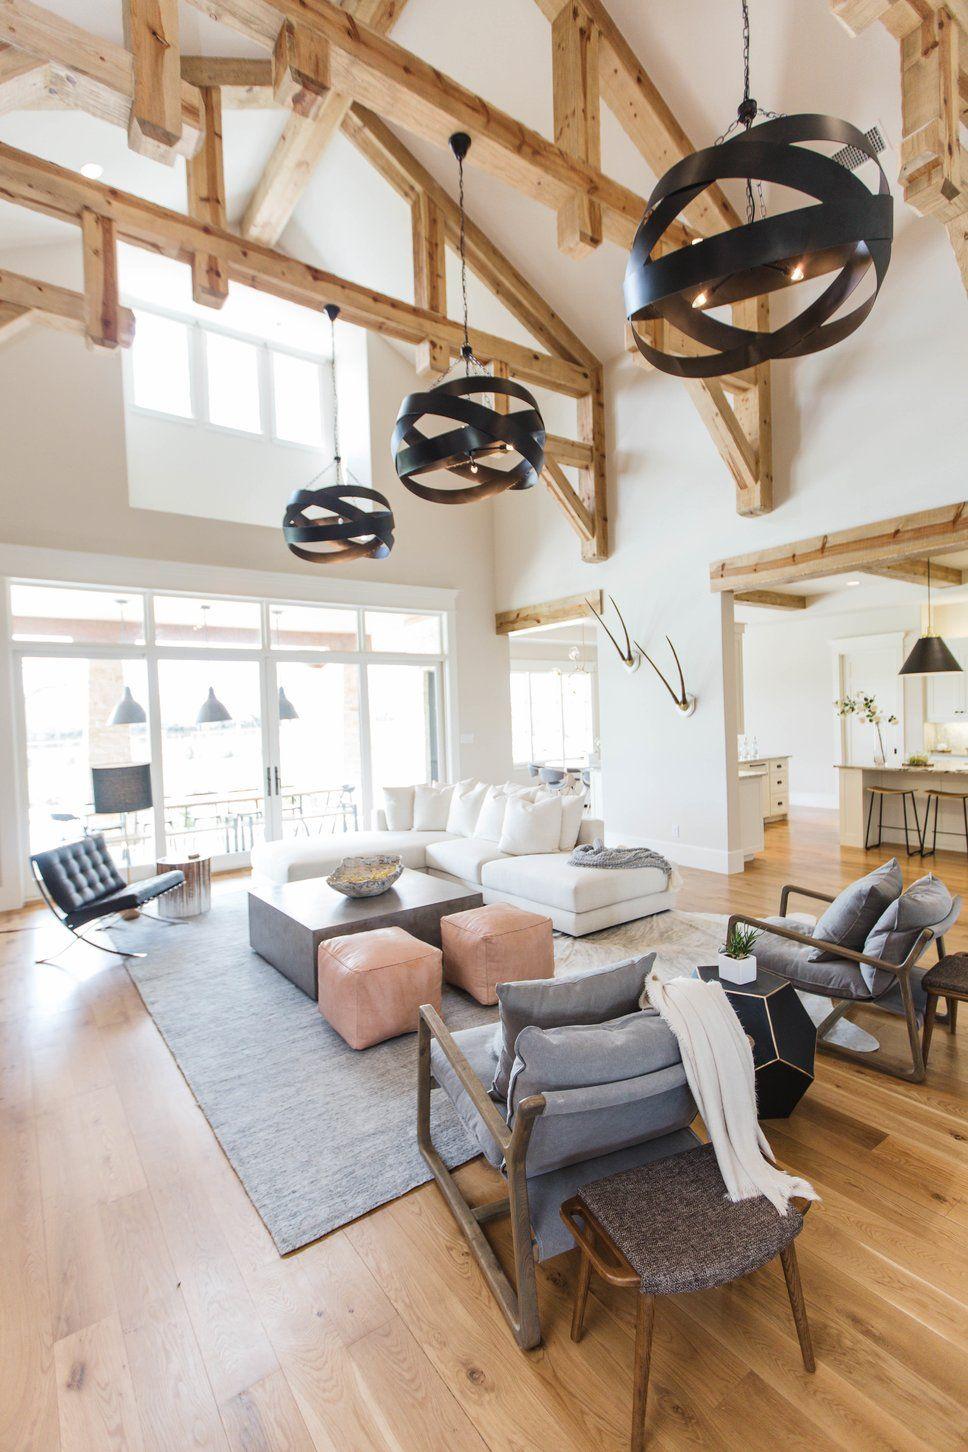 Rustic Living Room Design by Urbanology Designs in Rustic ...